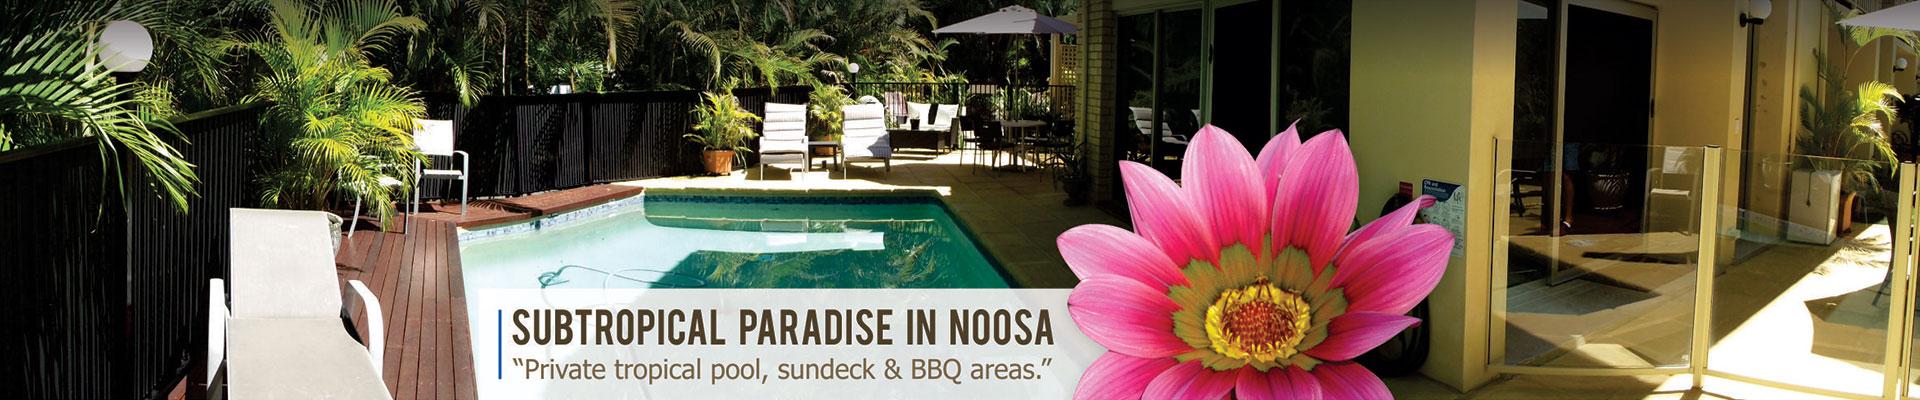 Subtropical paradise in Noosa